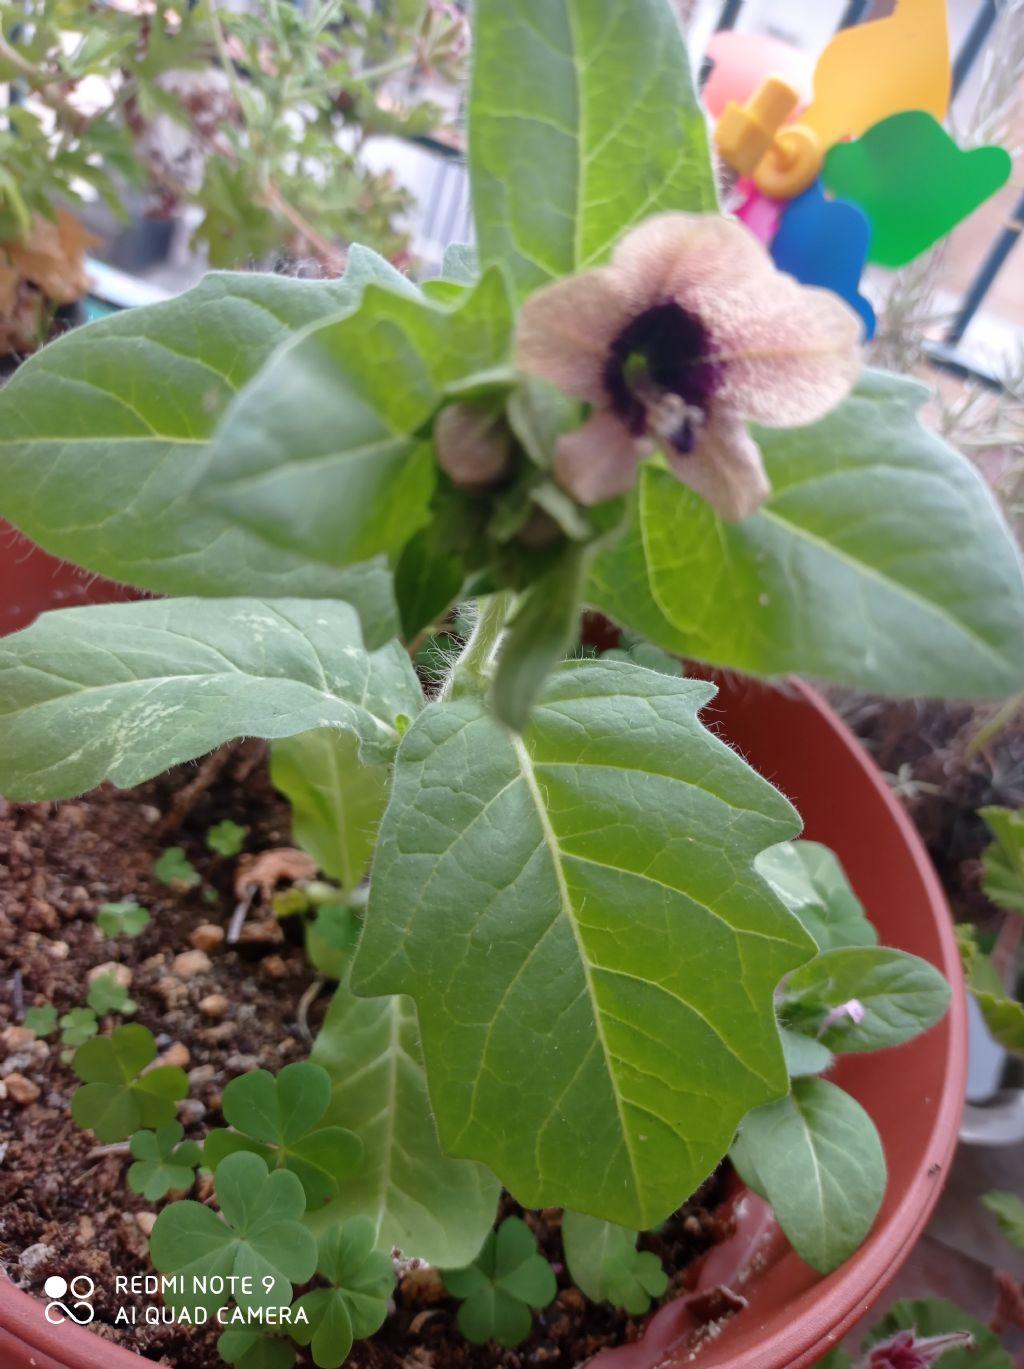 Pianta in vaso: Giusquiamo nero / Hyoscyamus niger (Solanaceae)